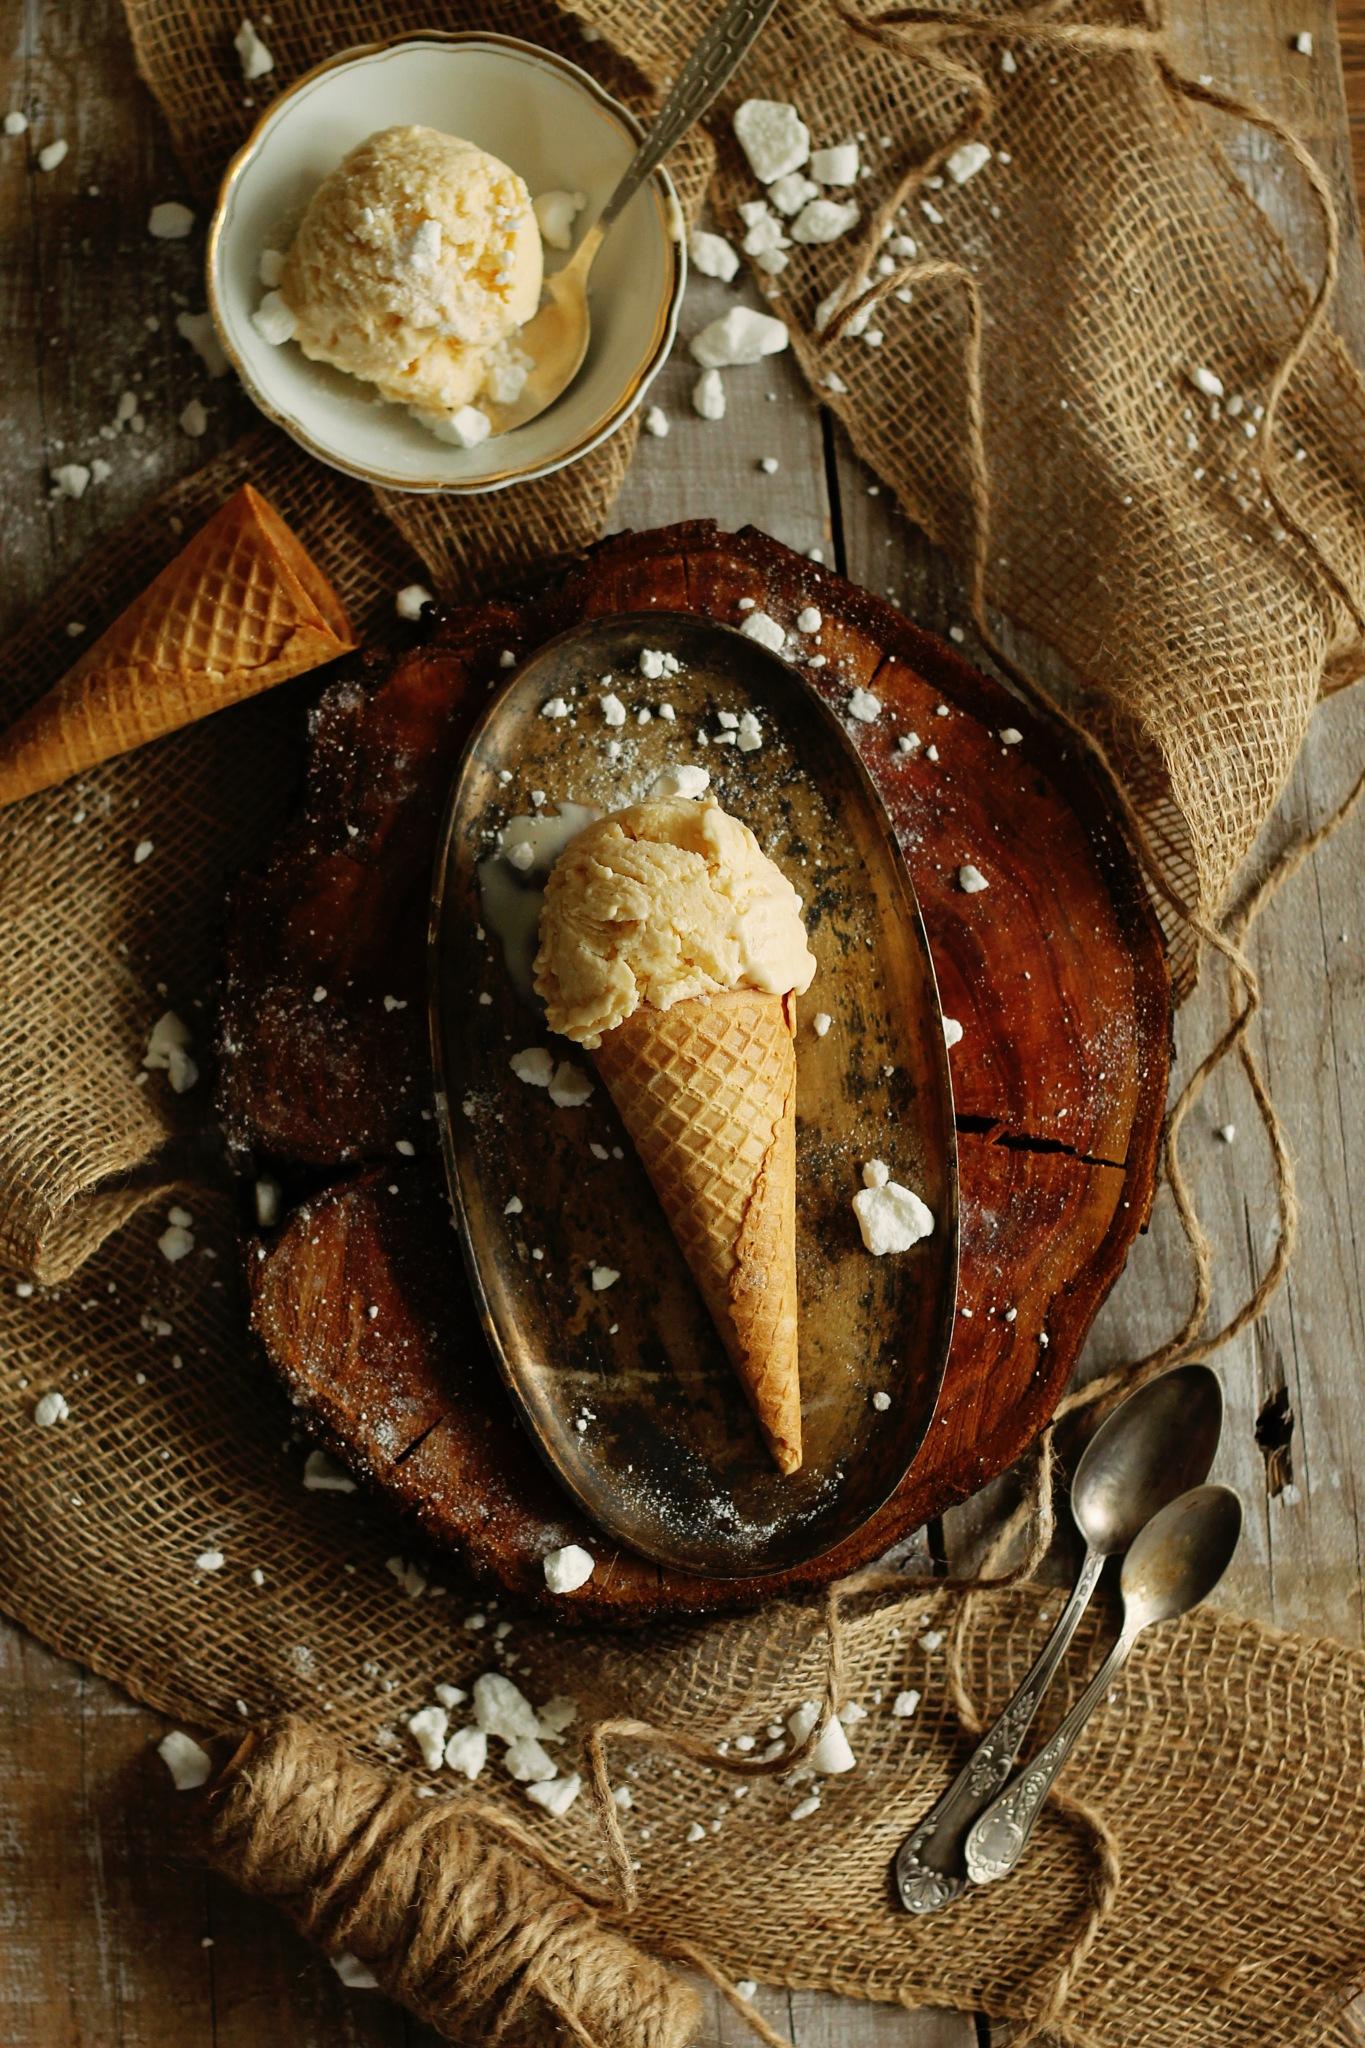 Brown butter ice cream by Zaneta Hajnowska